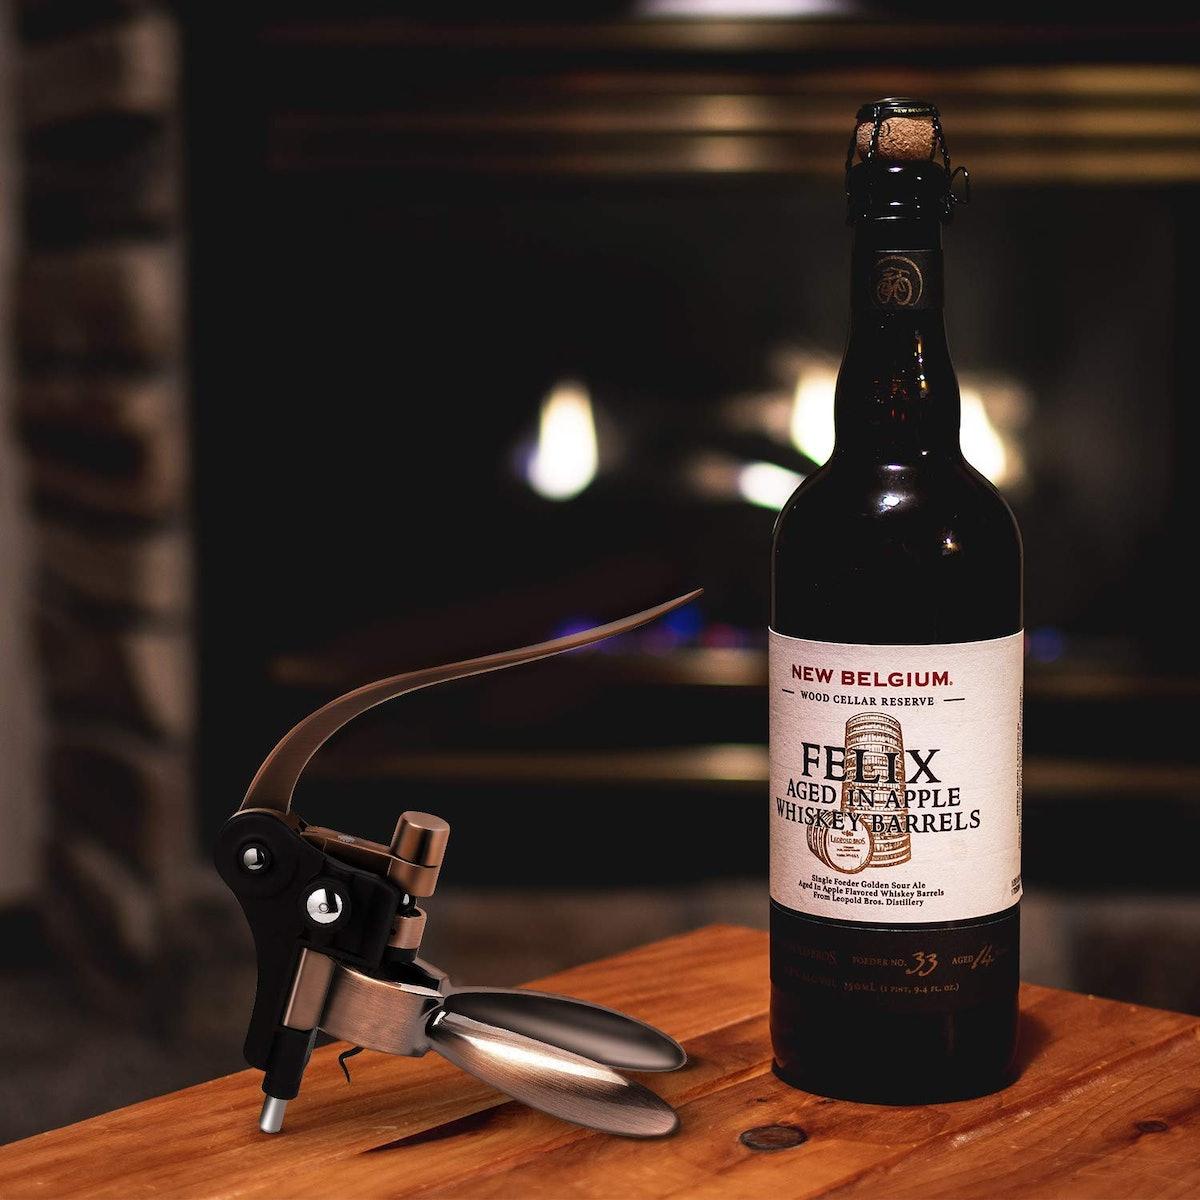 LM BODYCARE Wine Bottle Opener